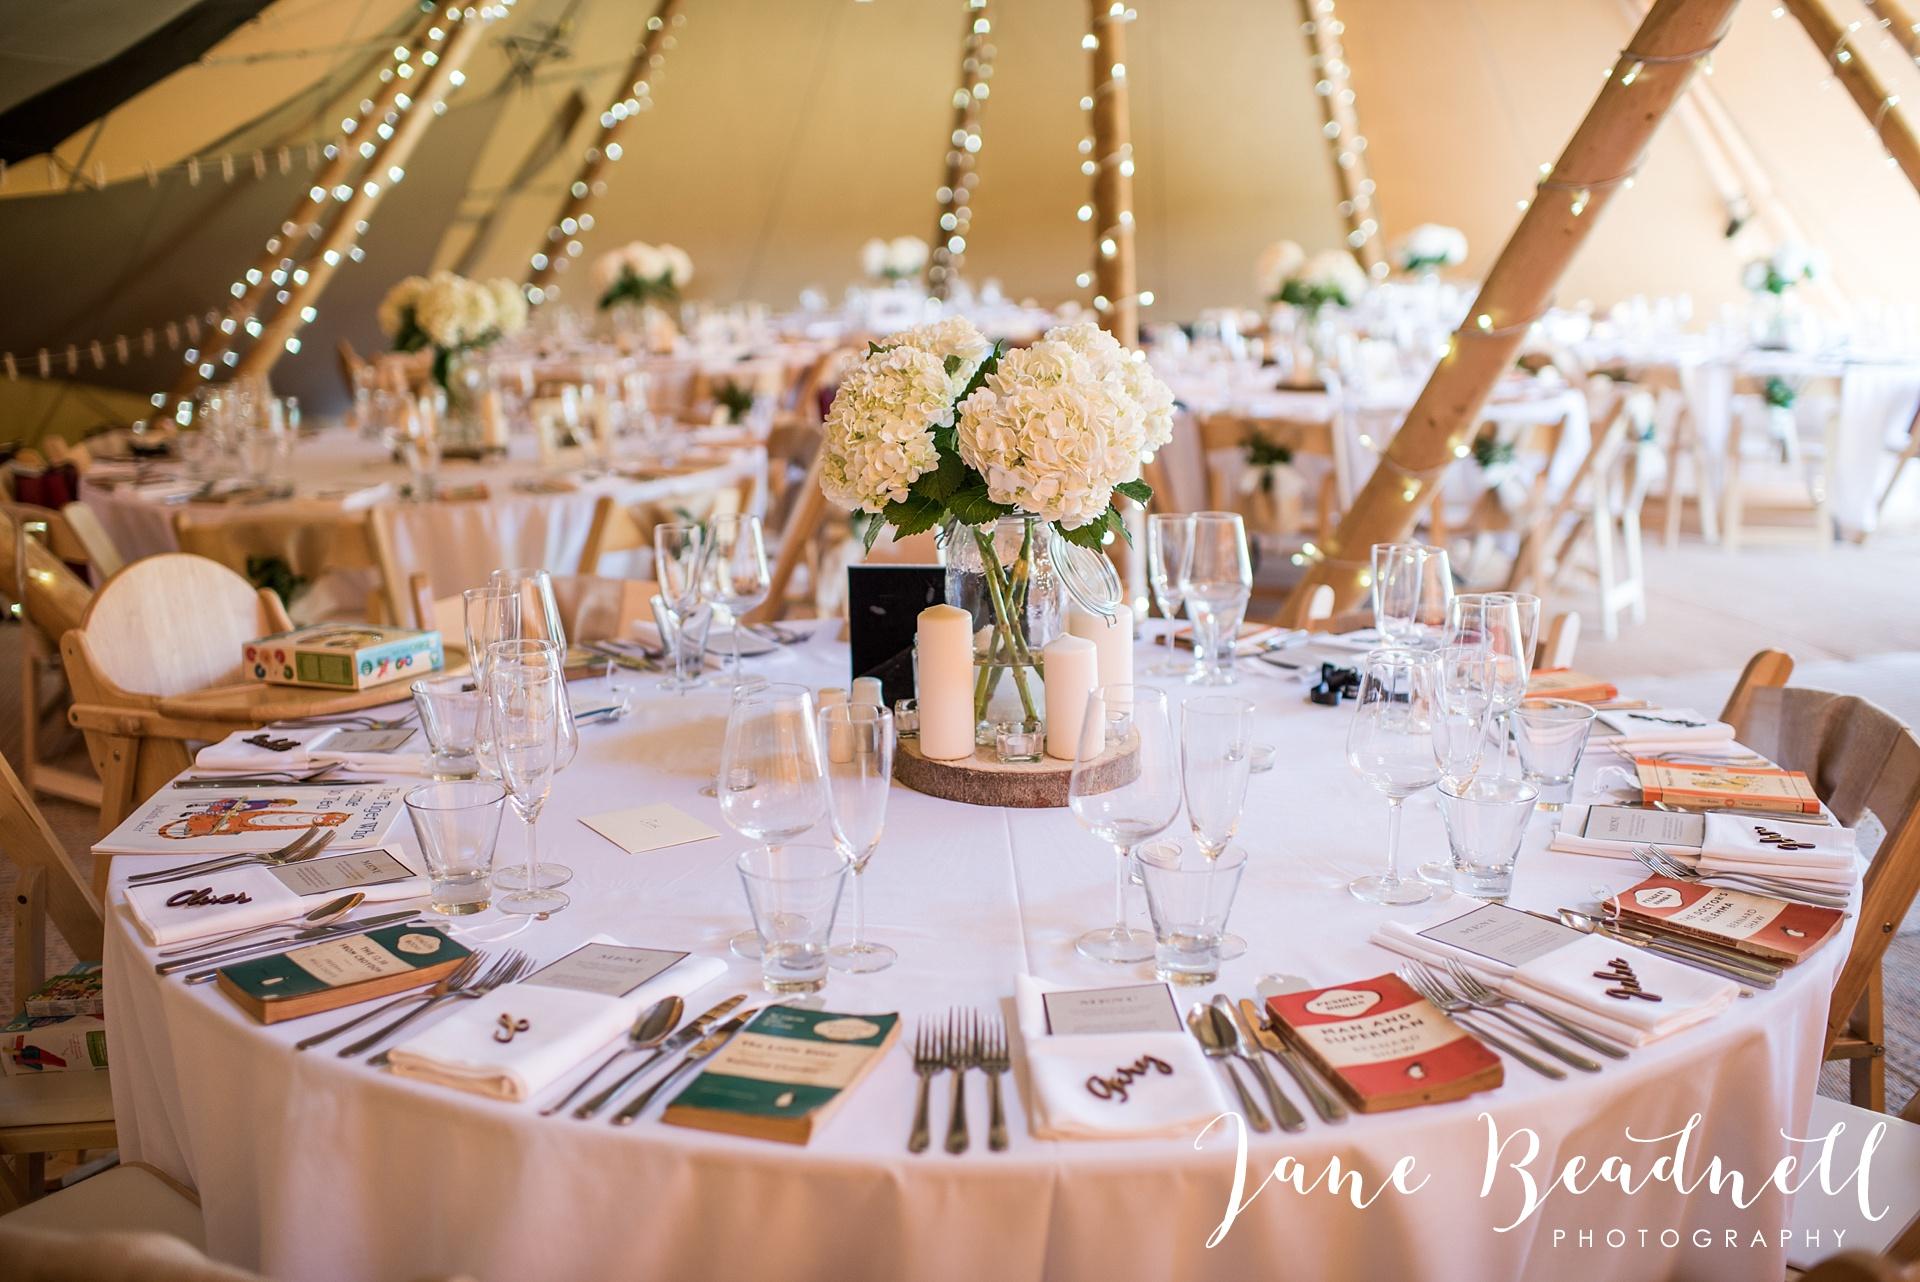 fine-art-wedding-photographer-jane-beadnell-yorkshire-wedding-photographer_0098